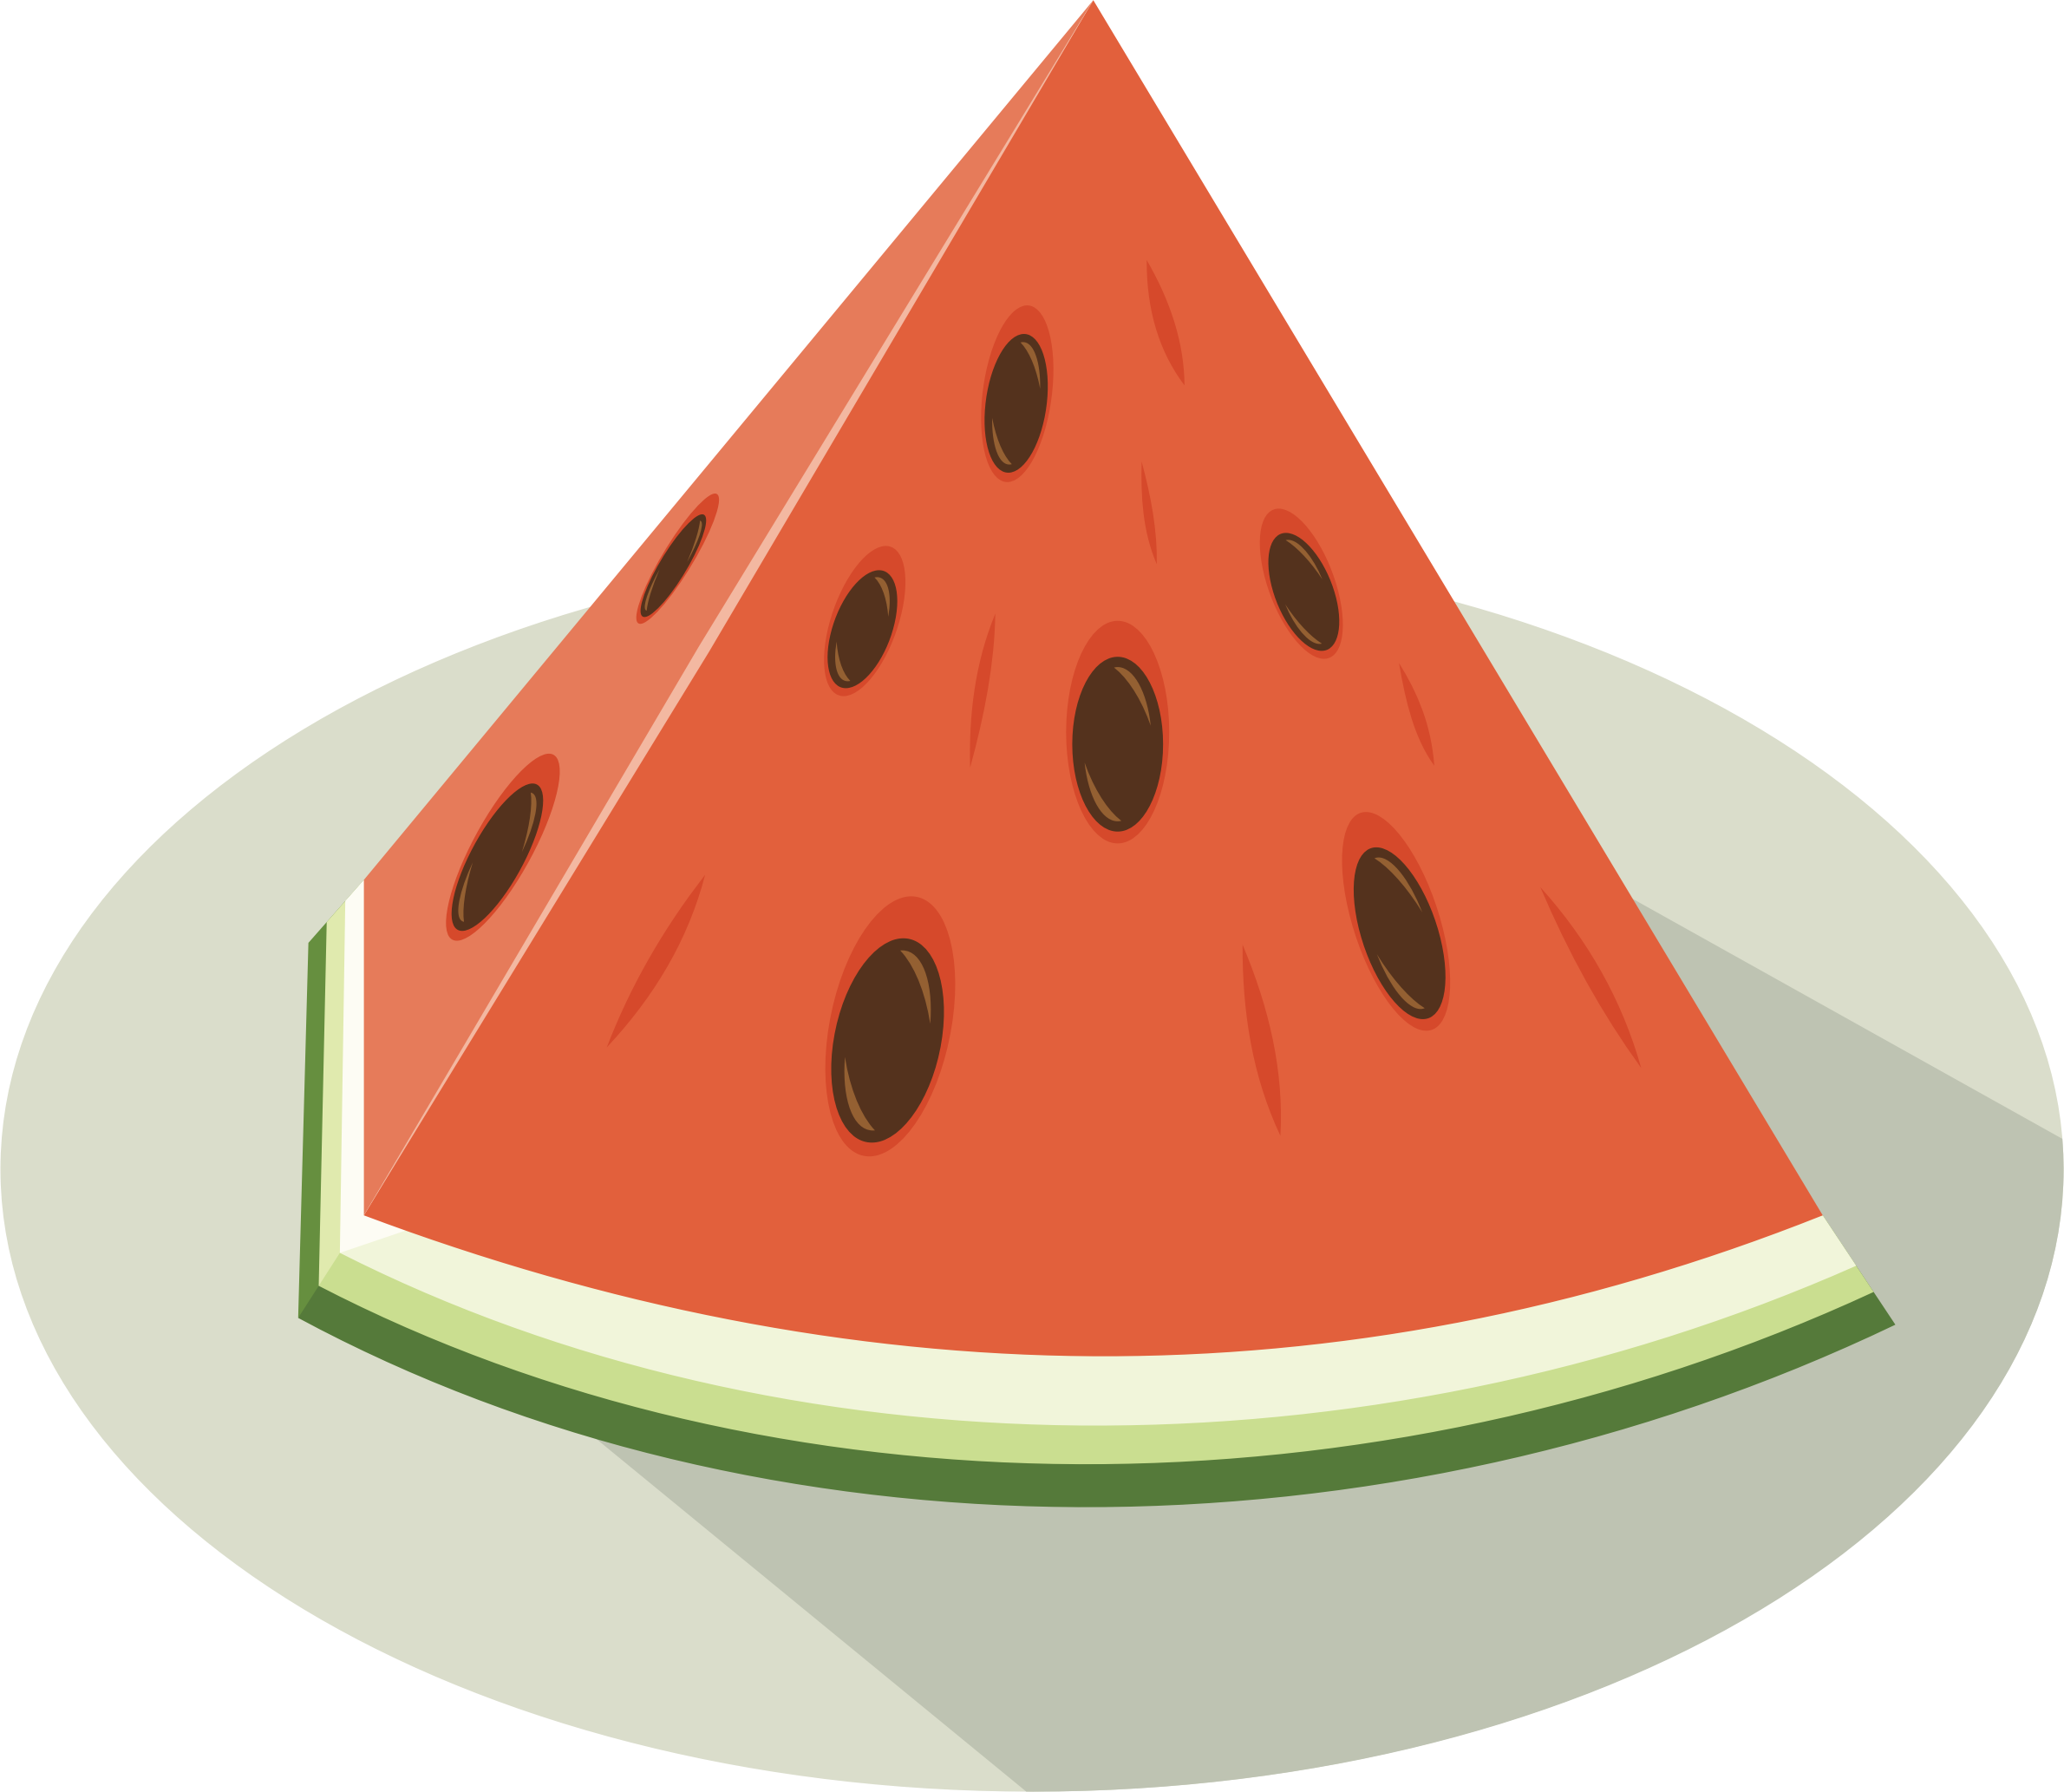 Slice big image png. Watermelon clipart small watermelon